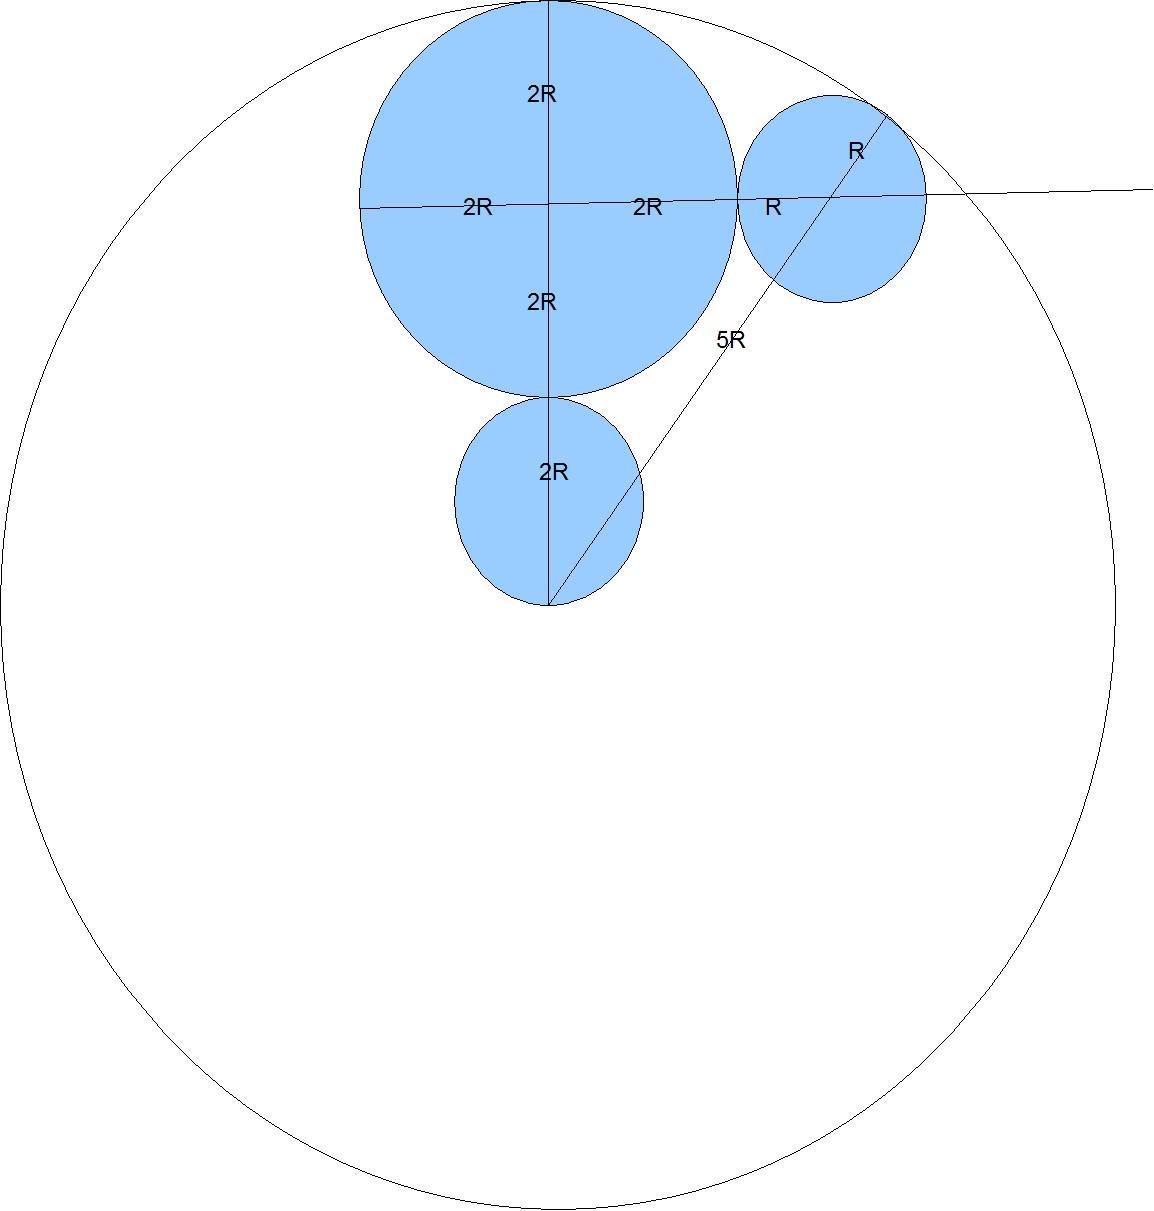 http://www.prise2tete.fr/upload/gwen27-ovoide.jpg